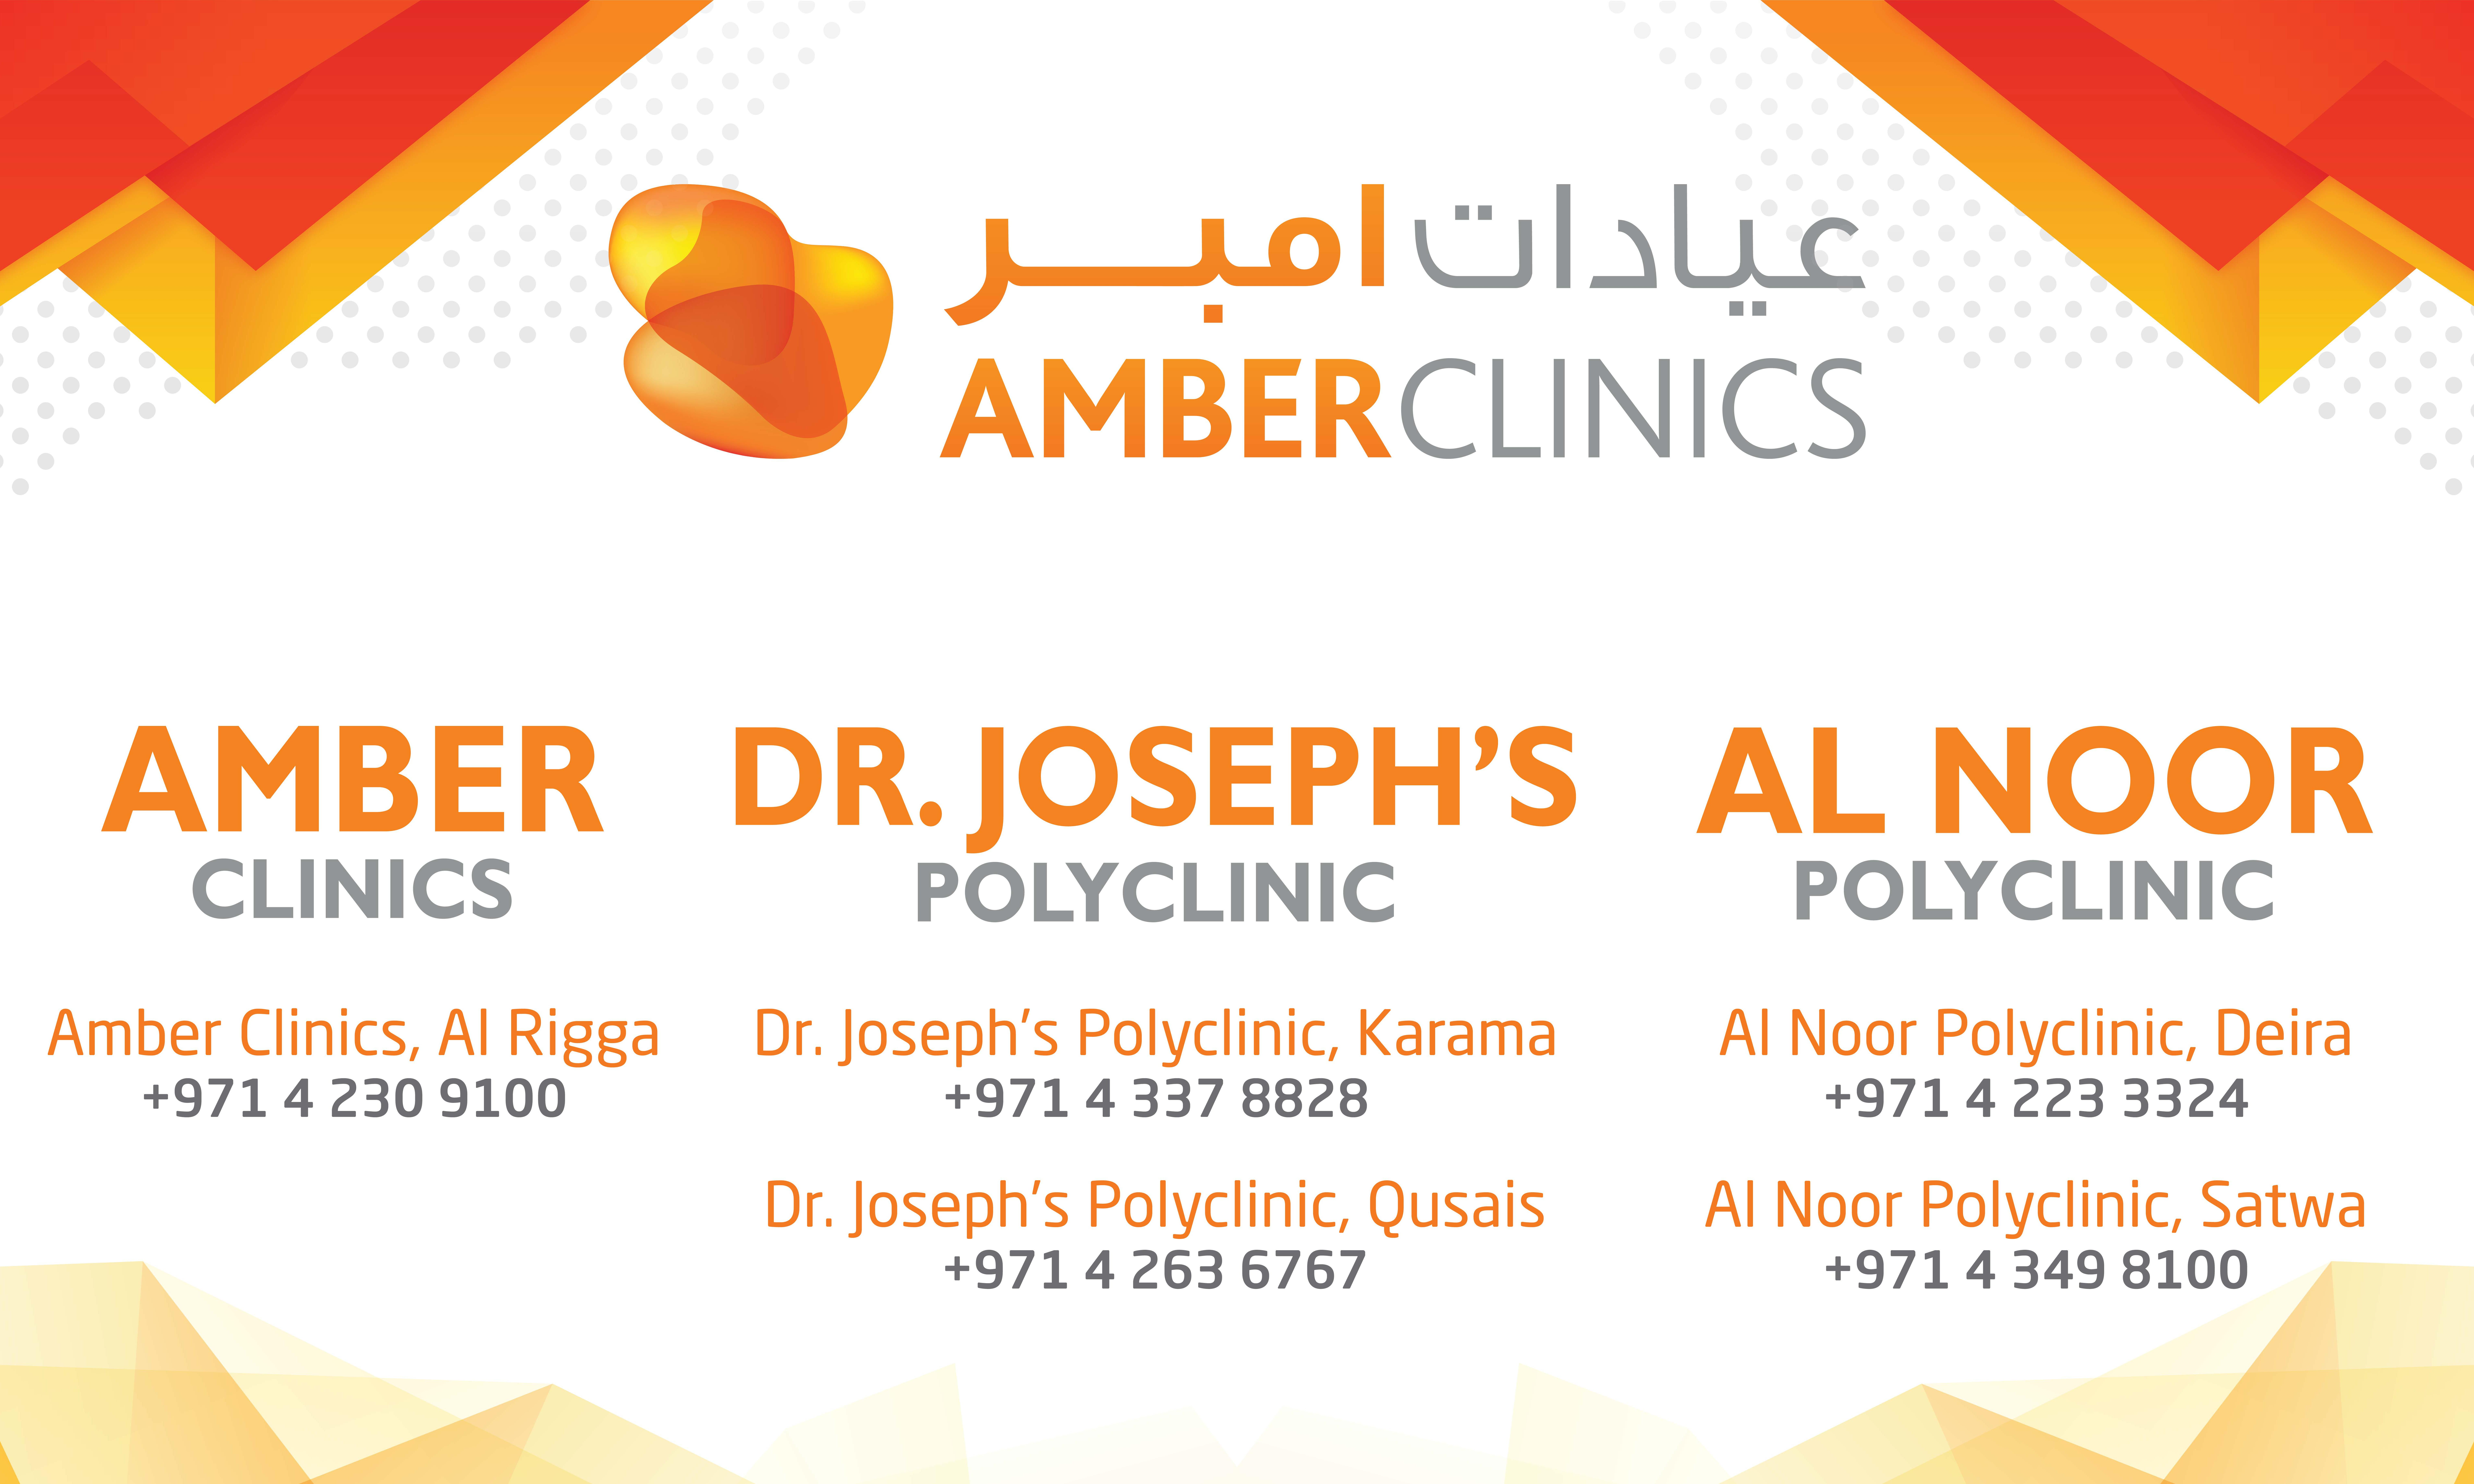 Cardiology specialist in Deira